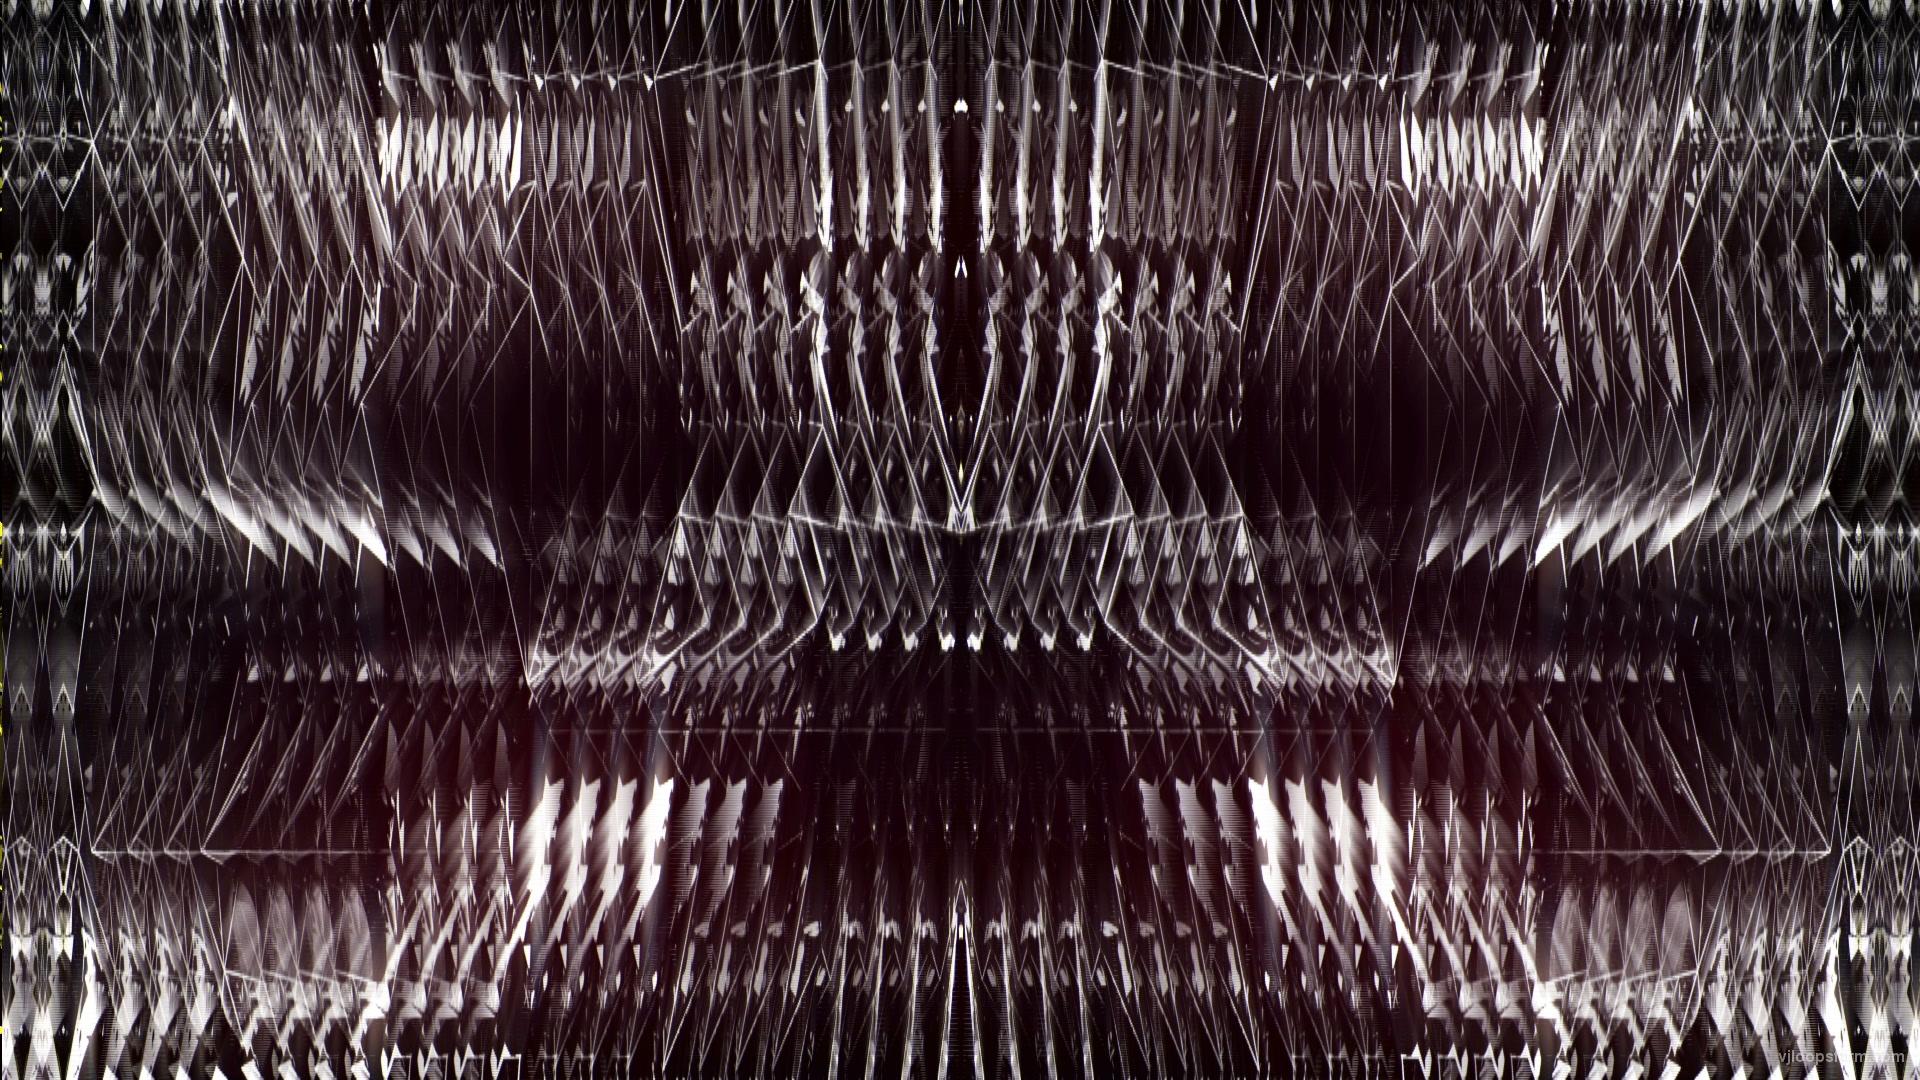 vj video background Abstract-Black-Foil-Wireframe-Video-Art-Motion-Background-Pattern-Video-Art-VJ-Loop_003